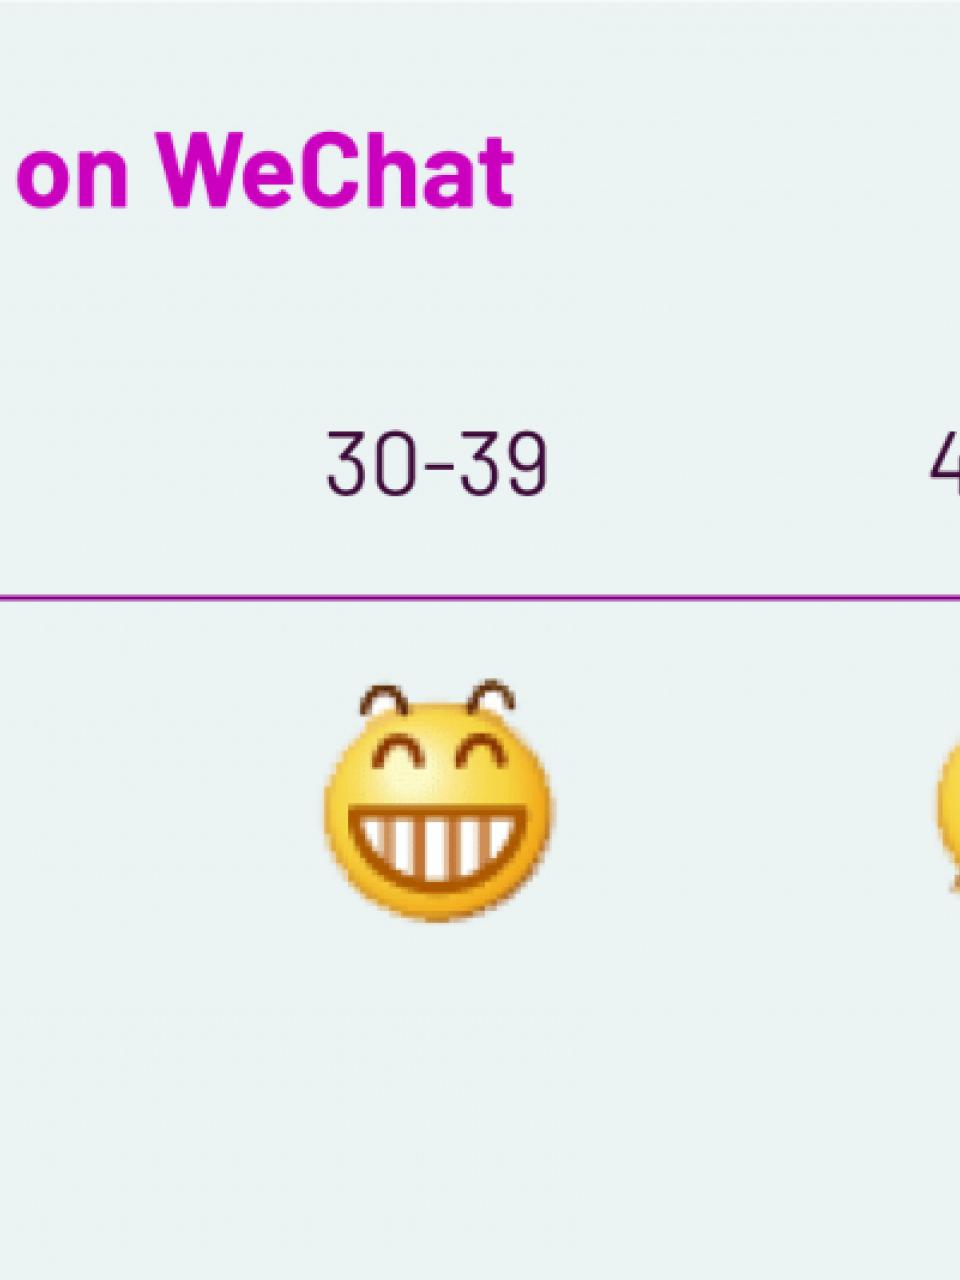 Slight meaning wechat emoji 🙂Slightly Smiling